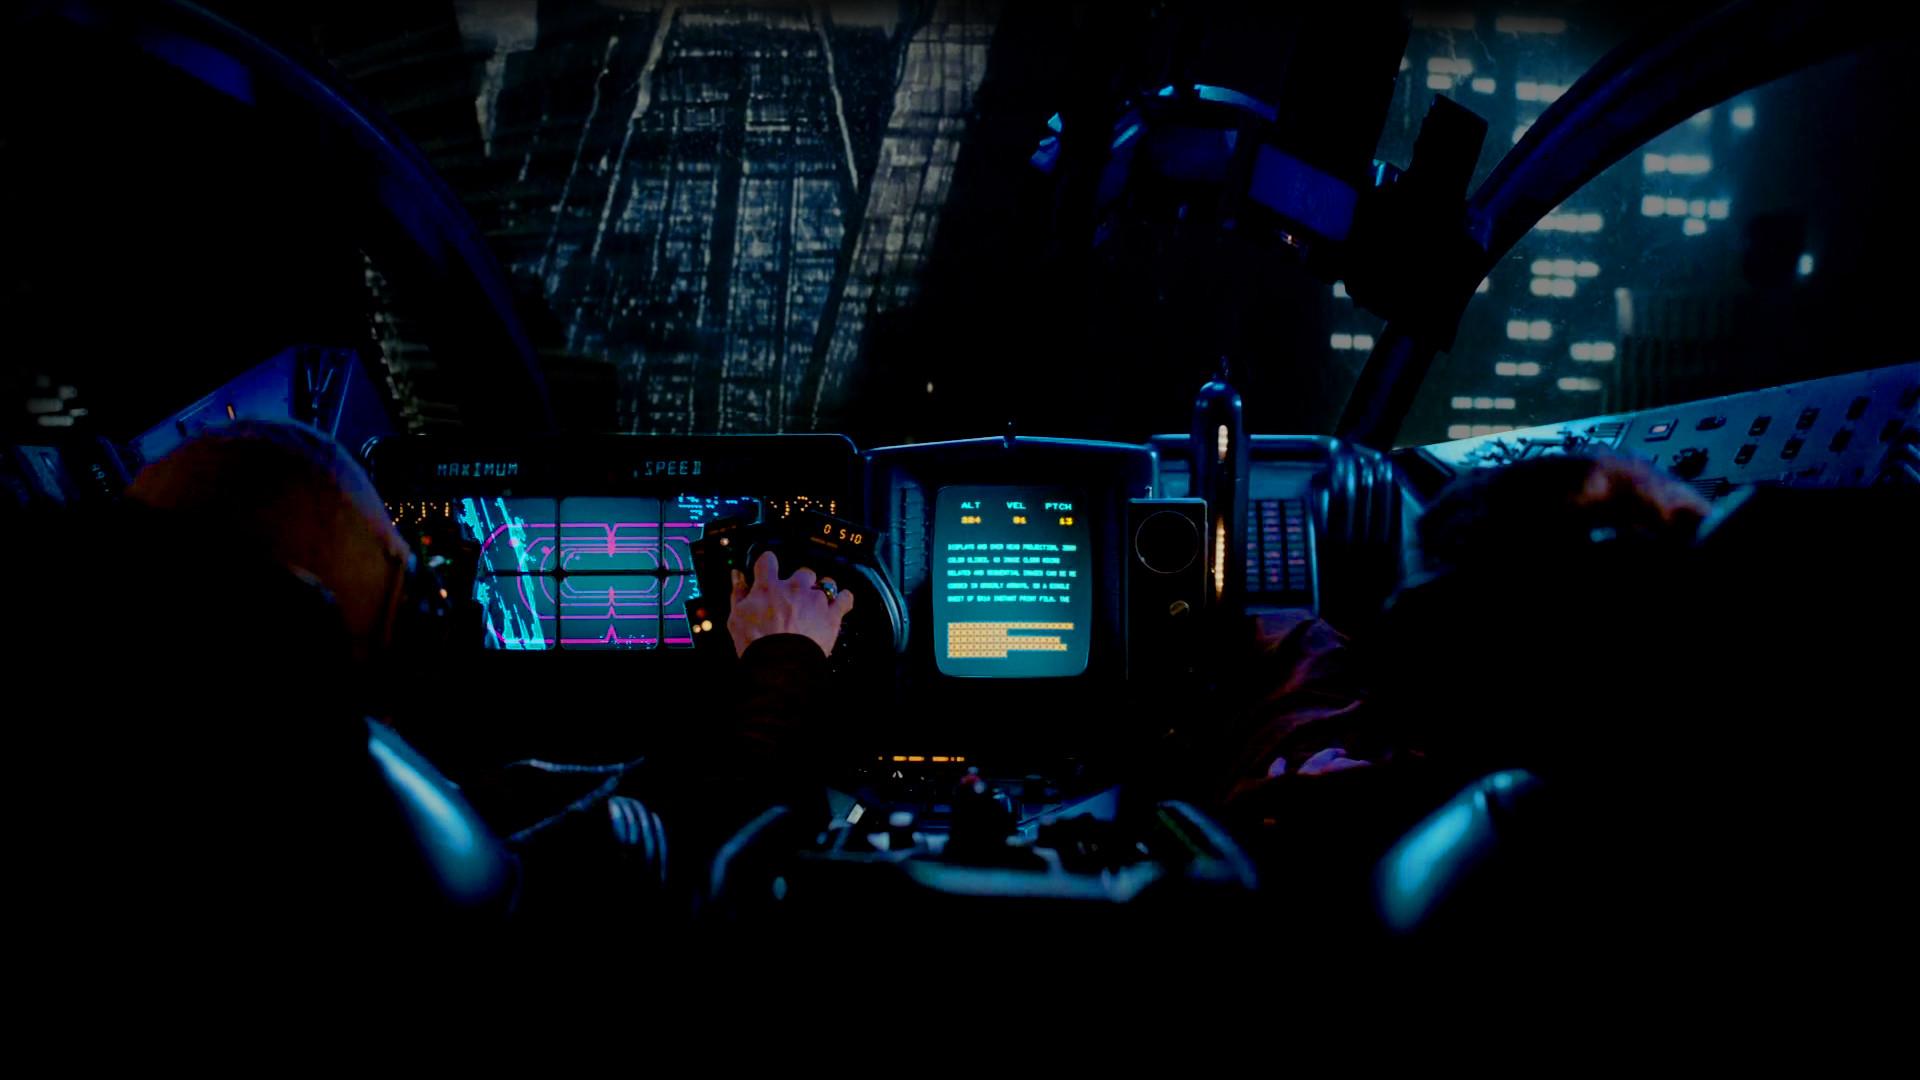 Blade Runner (1982)[1920×1080] Need #iPhone #6S #Plus #Wallpaper/  #Background for #IPhone6SPlus? Follow iPhone 6S Plus 3Wallpapers/  #Backgrounds Mu…